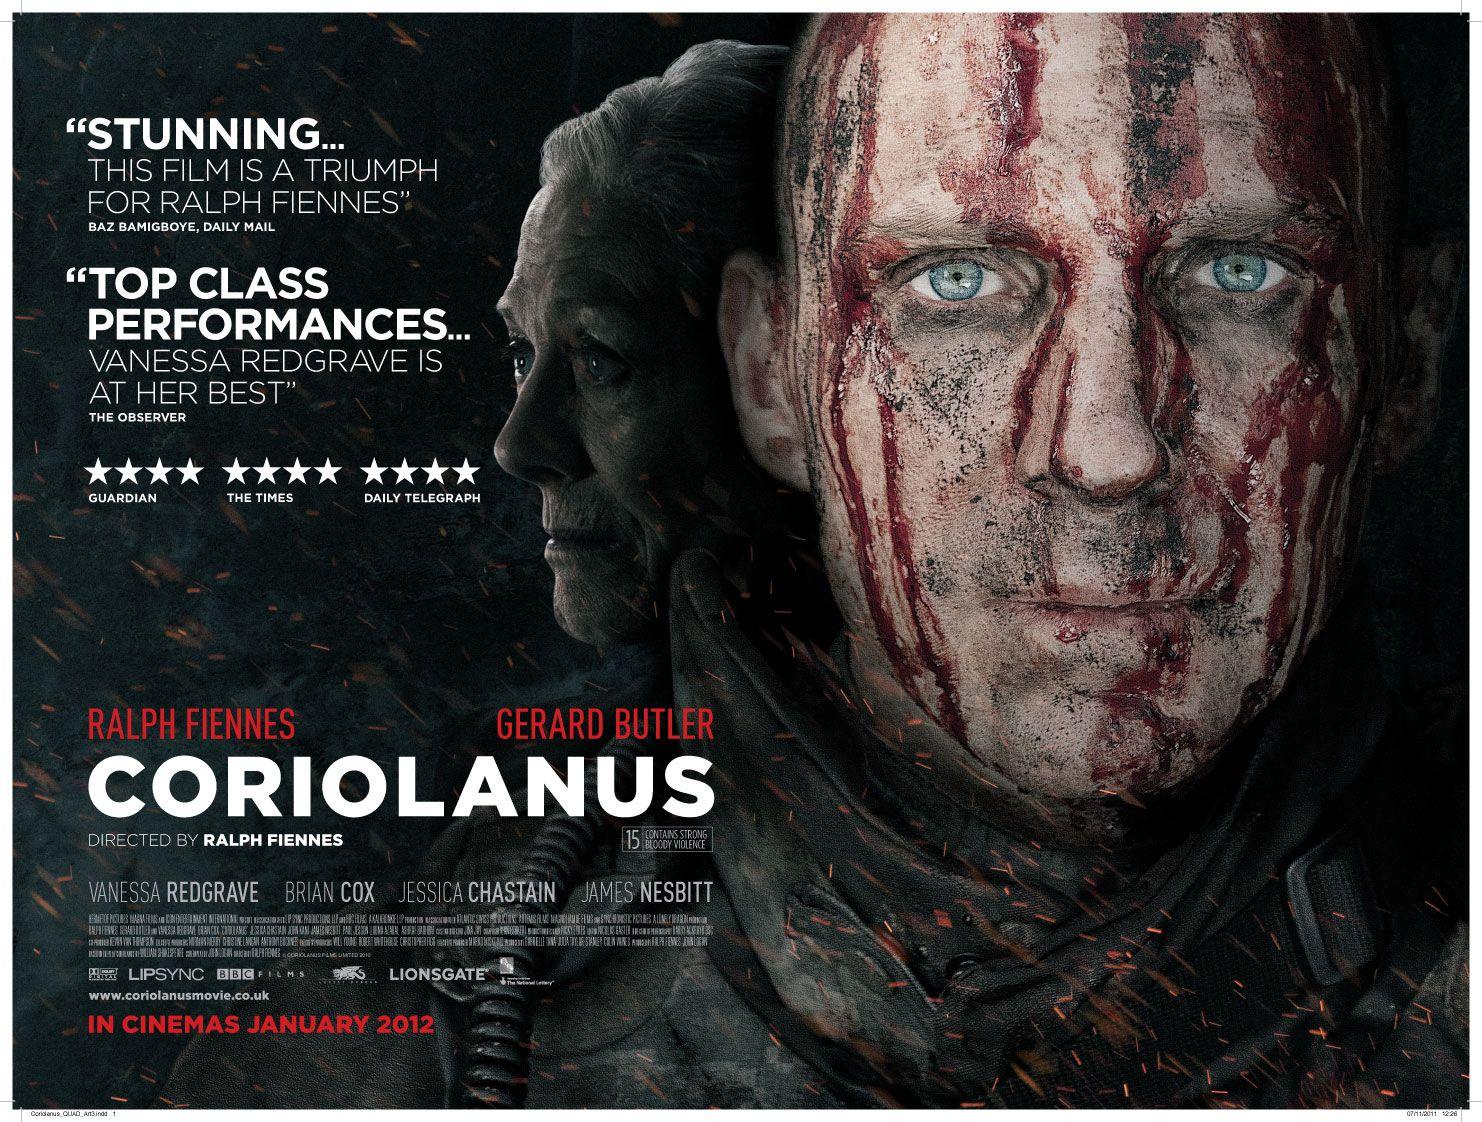 'Coriolanus' dir. Ralph Fiennes (with Gerard Butler, Vanessa Redgrave, Jessica Chastain, James Nesbitt)